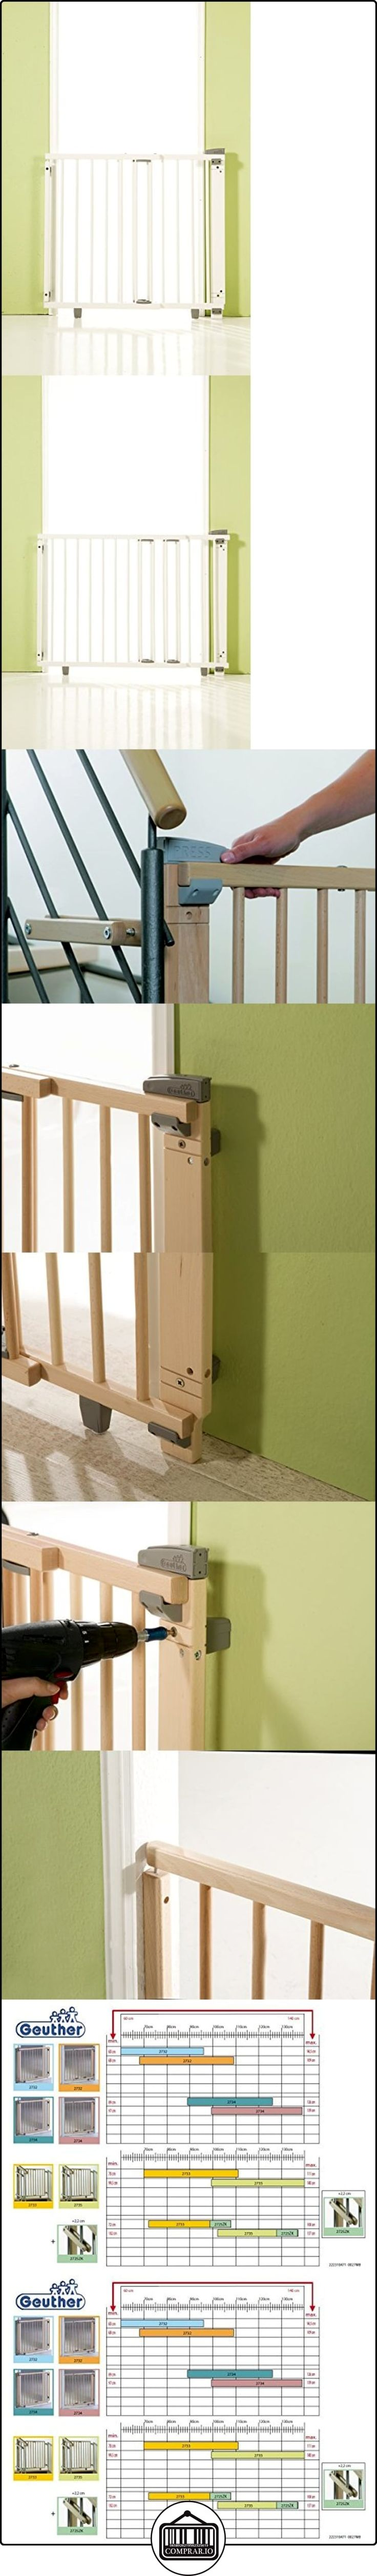 17 melhores ideias sobre geuther 2733 no pinterest betten f r kleinkinder kinderbett. Black Bedroom Furniture Sets. Home Design Ideas